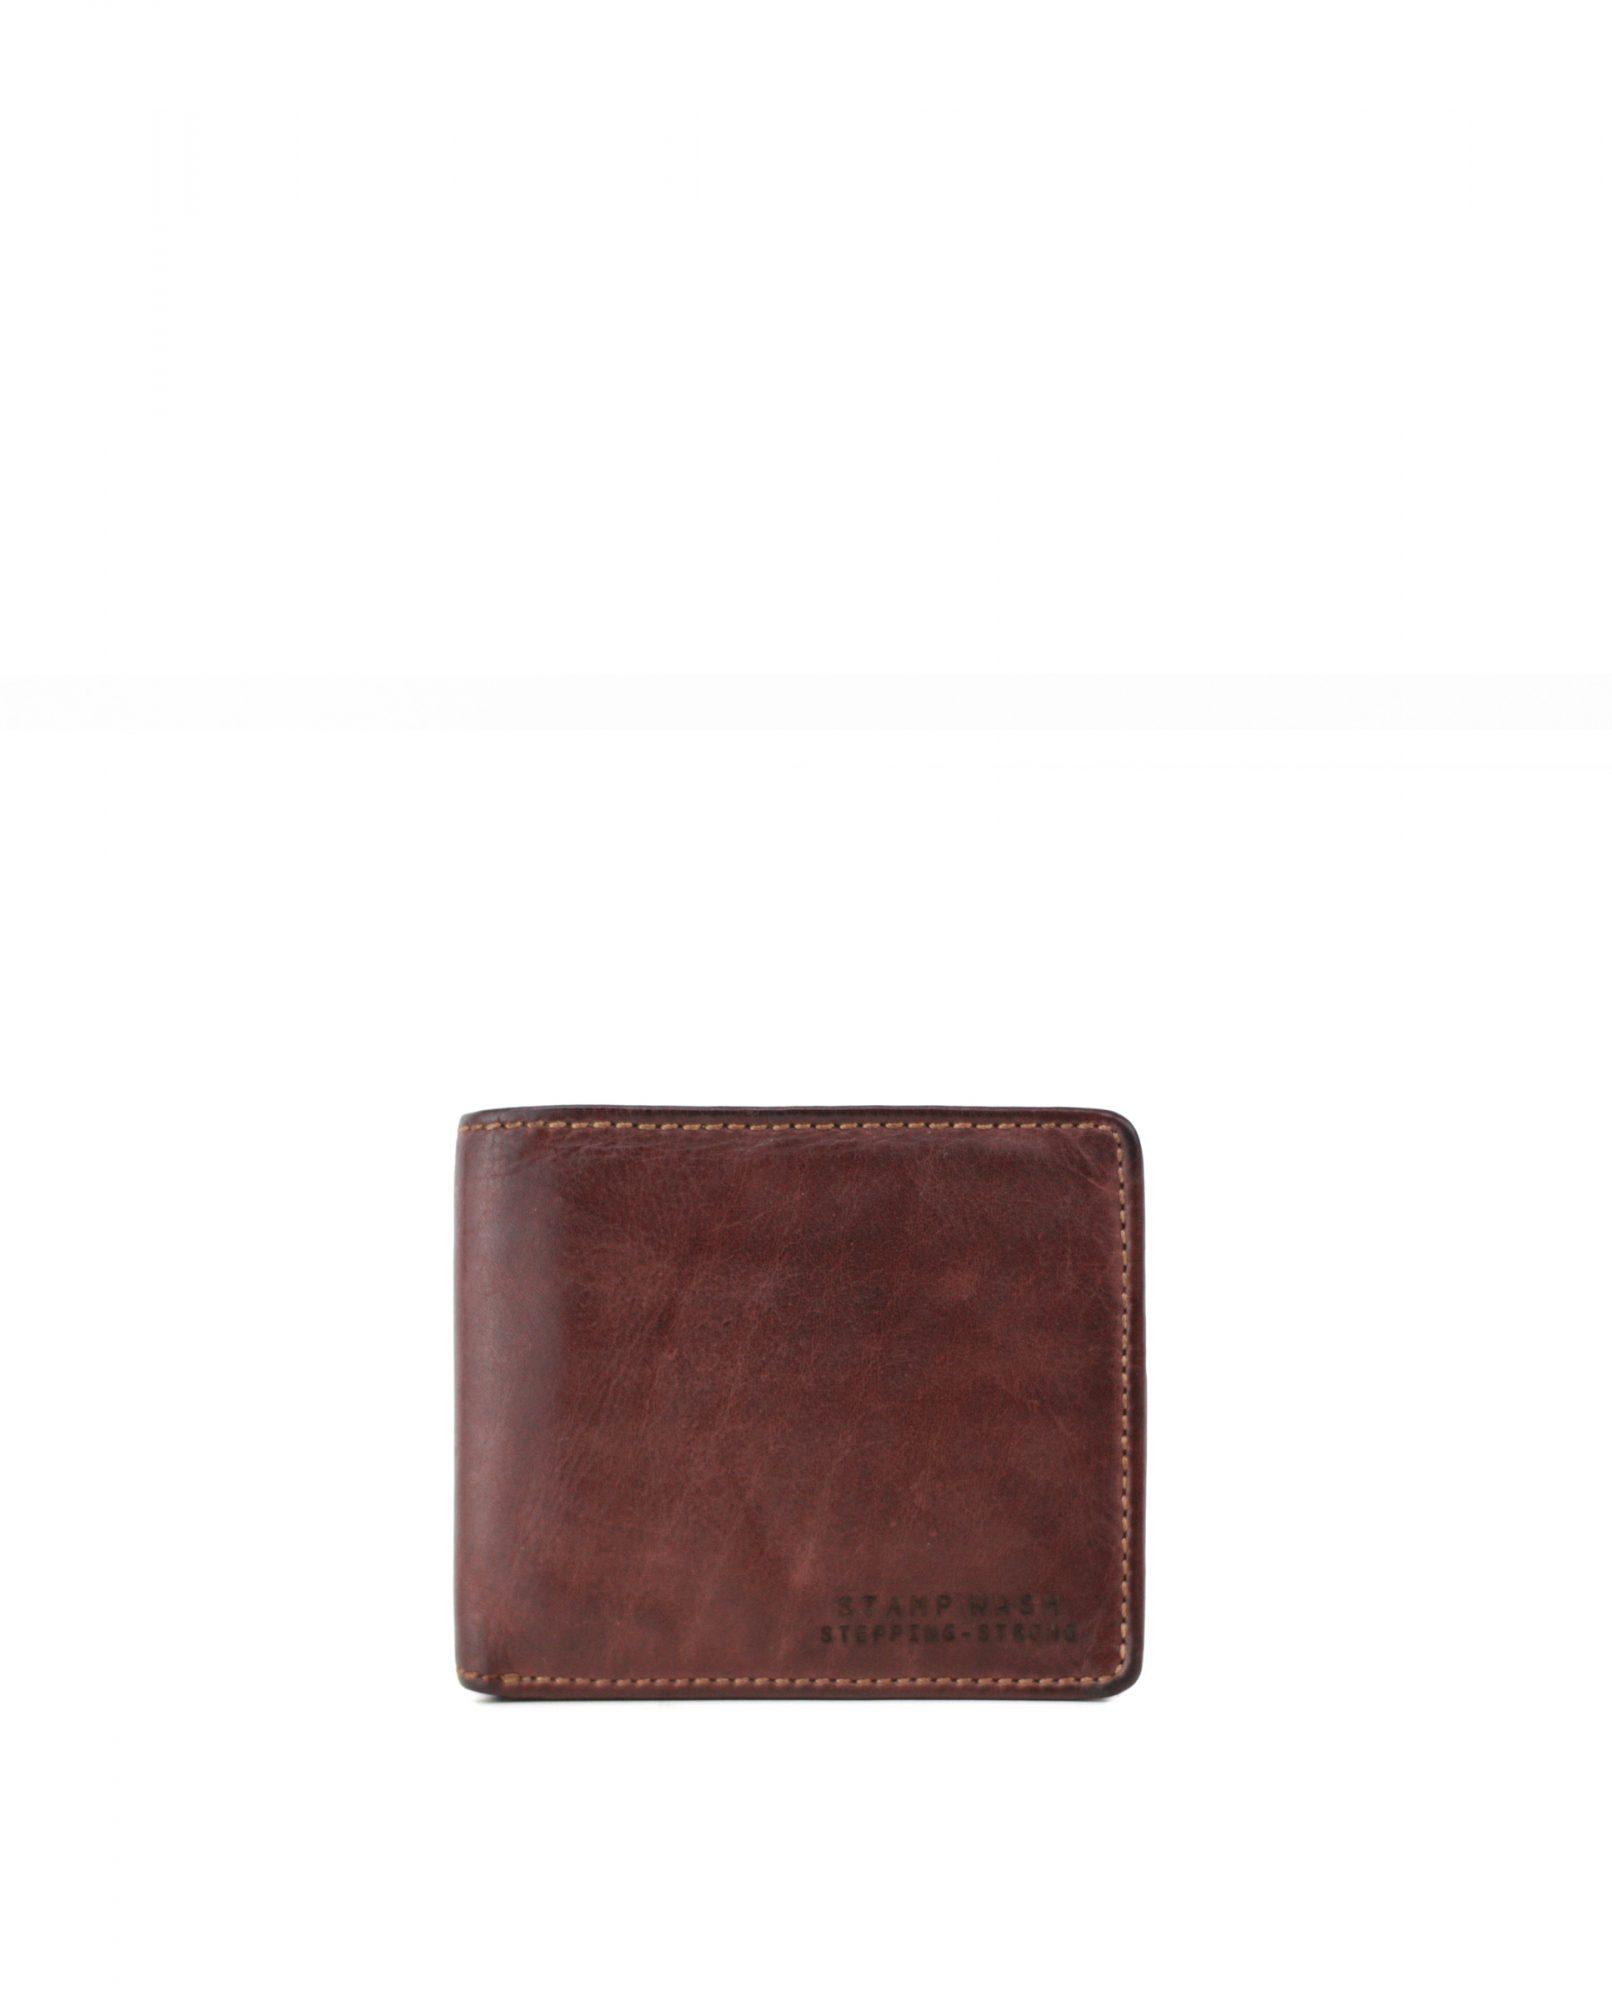 TICHI-Billetero de piel Stamp color líbano-MHST11986LB-STAMP